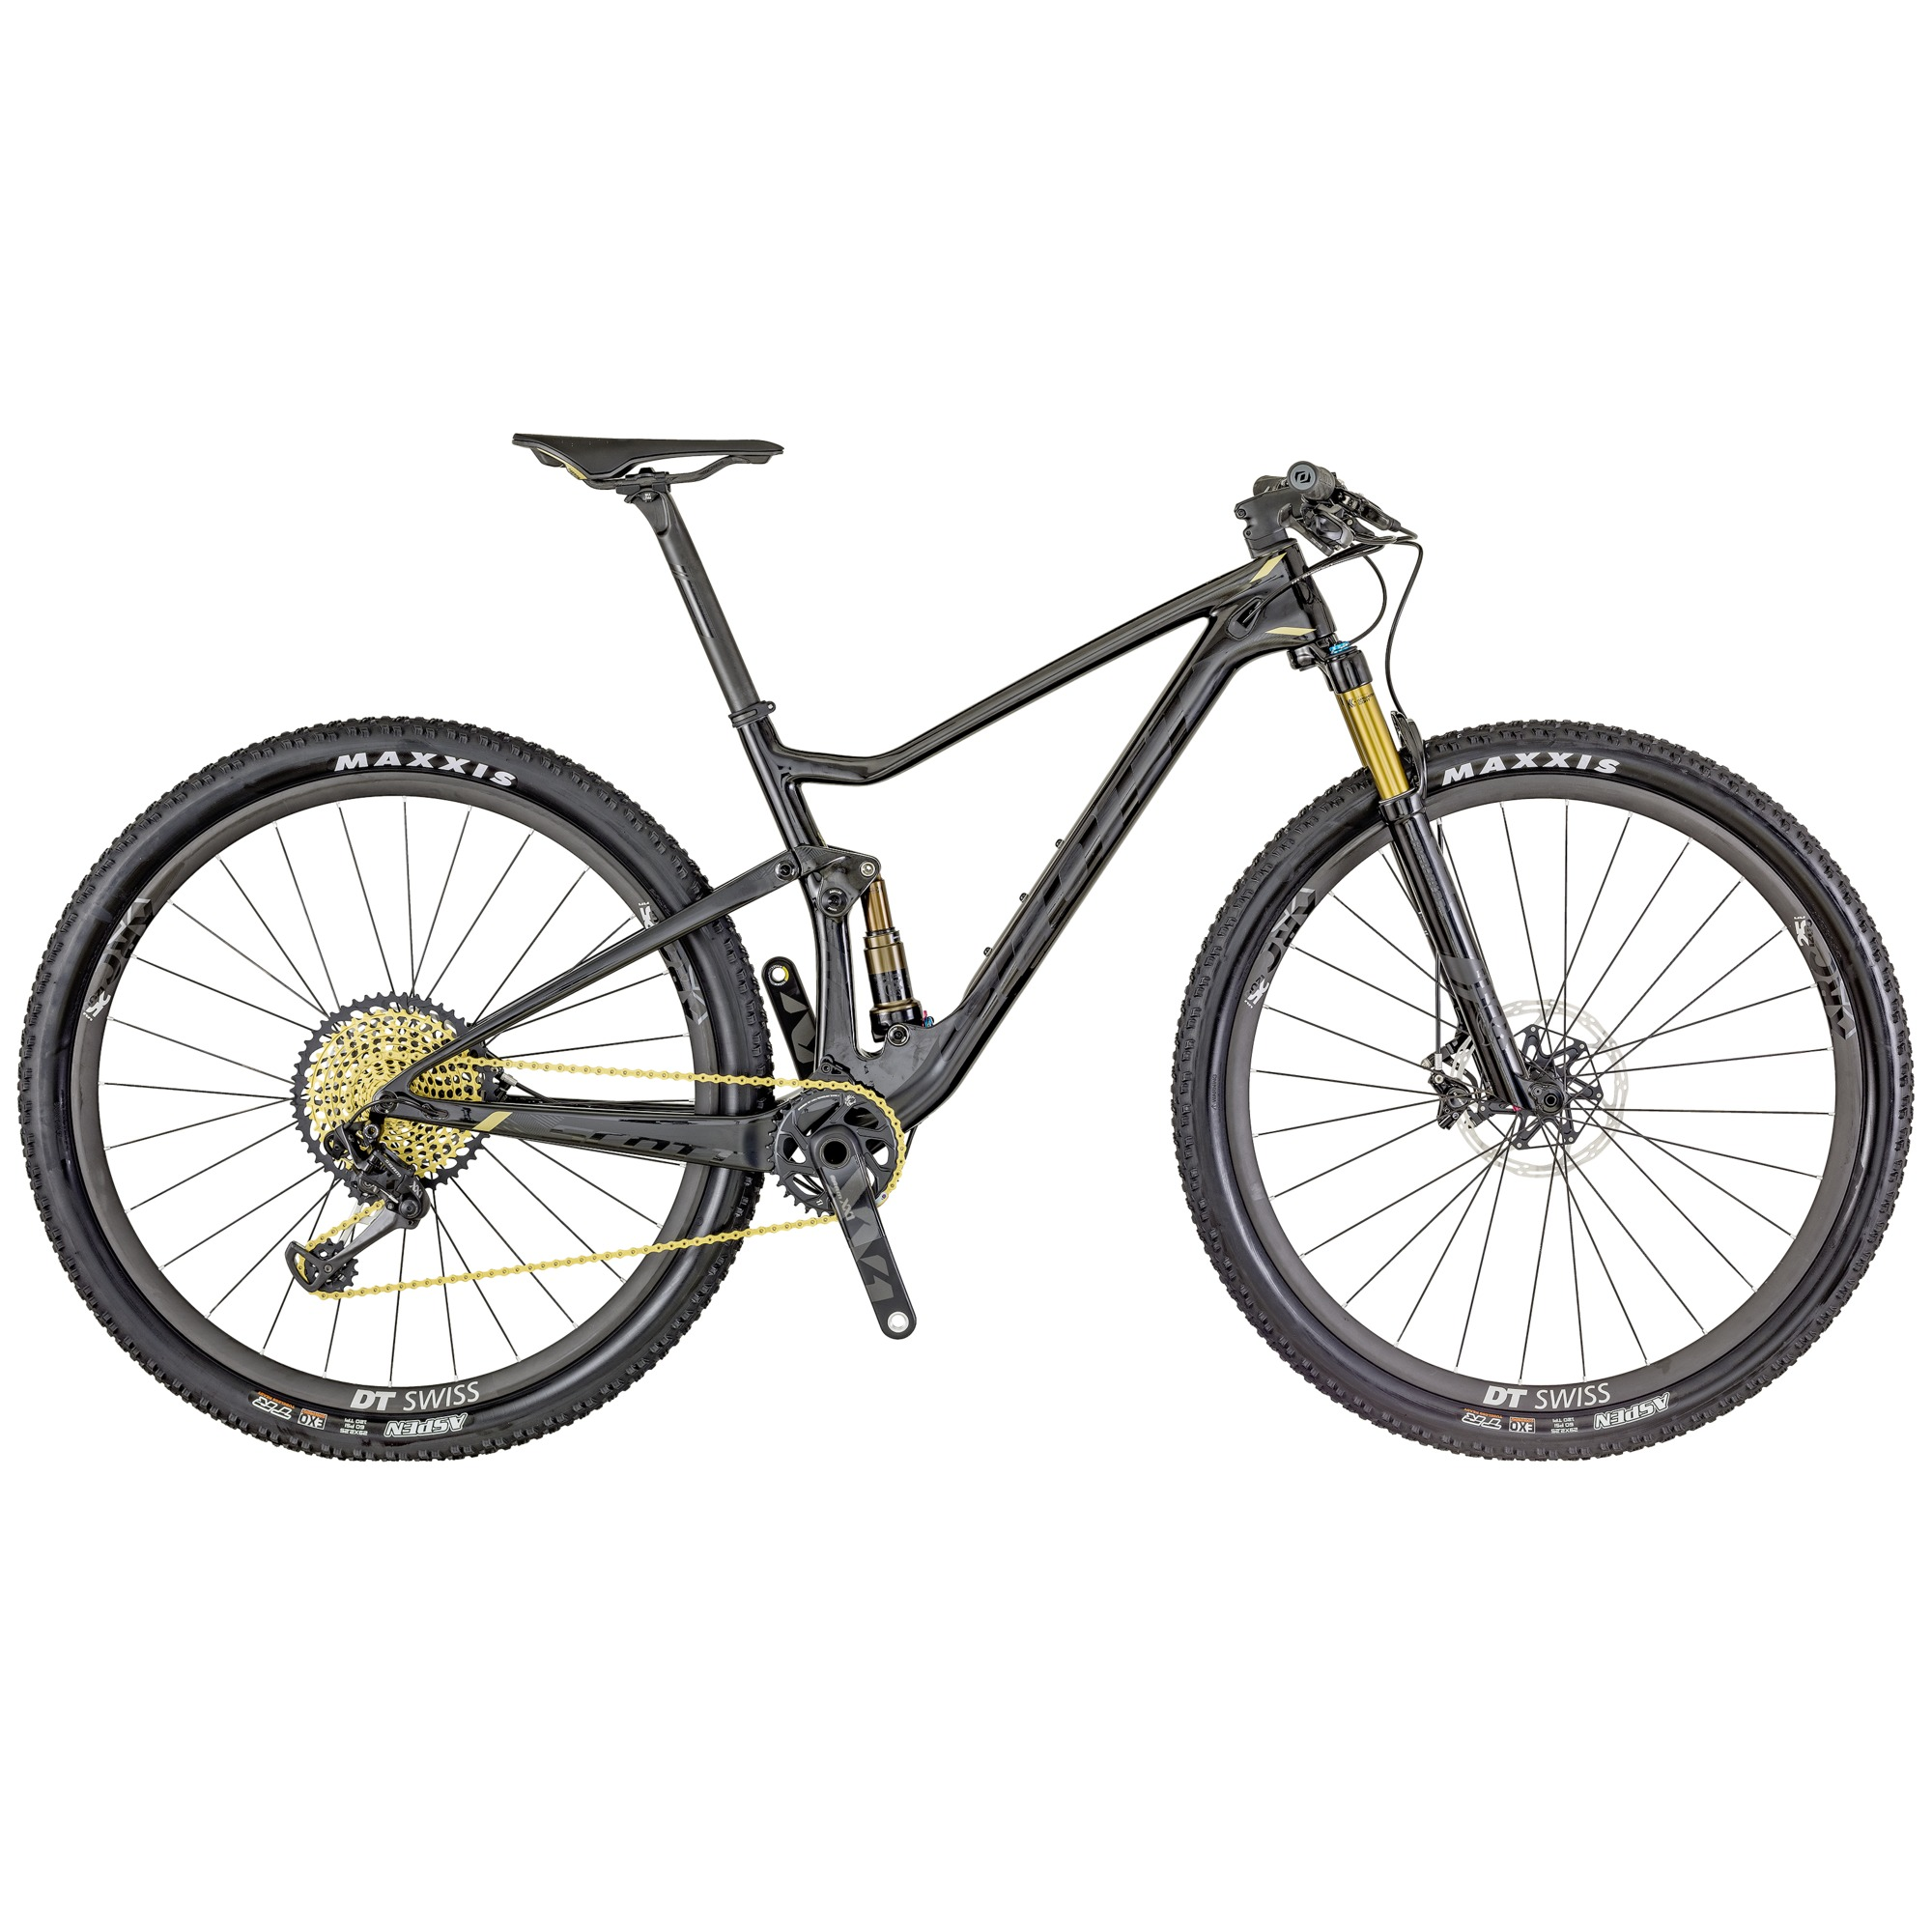 SCOTT Spark RC 900 SL Bike M - Rad & Dämpferklinik GmbH